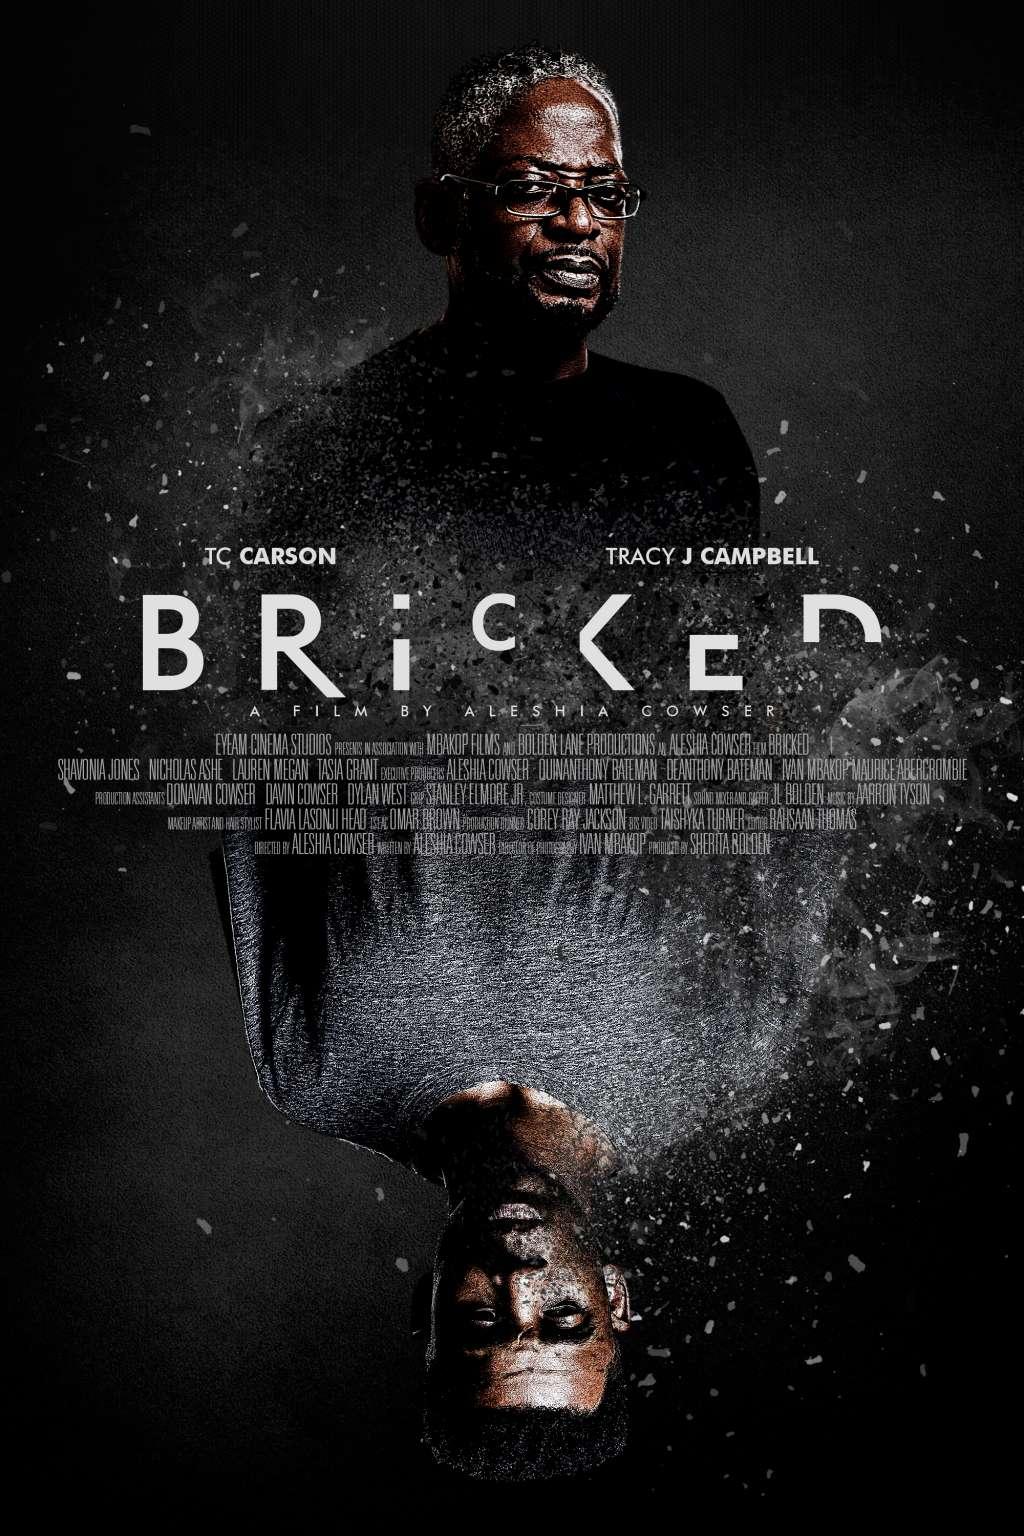 Bricked kapak